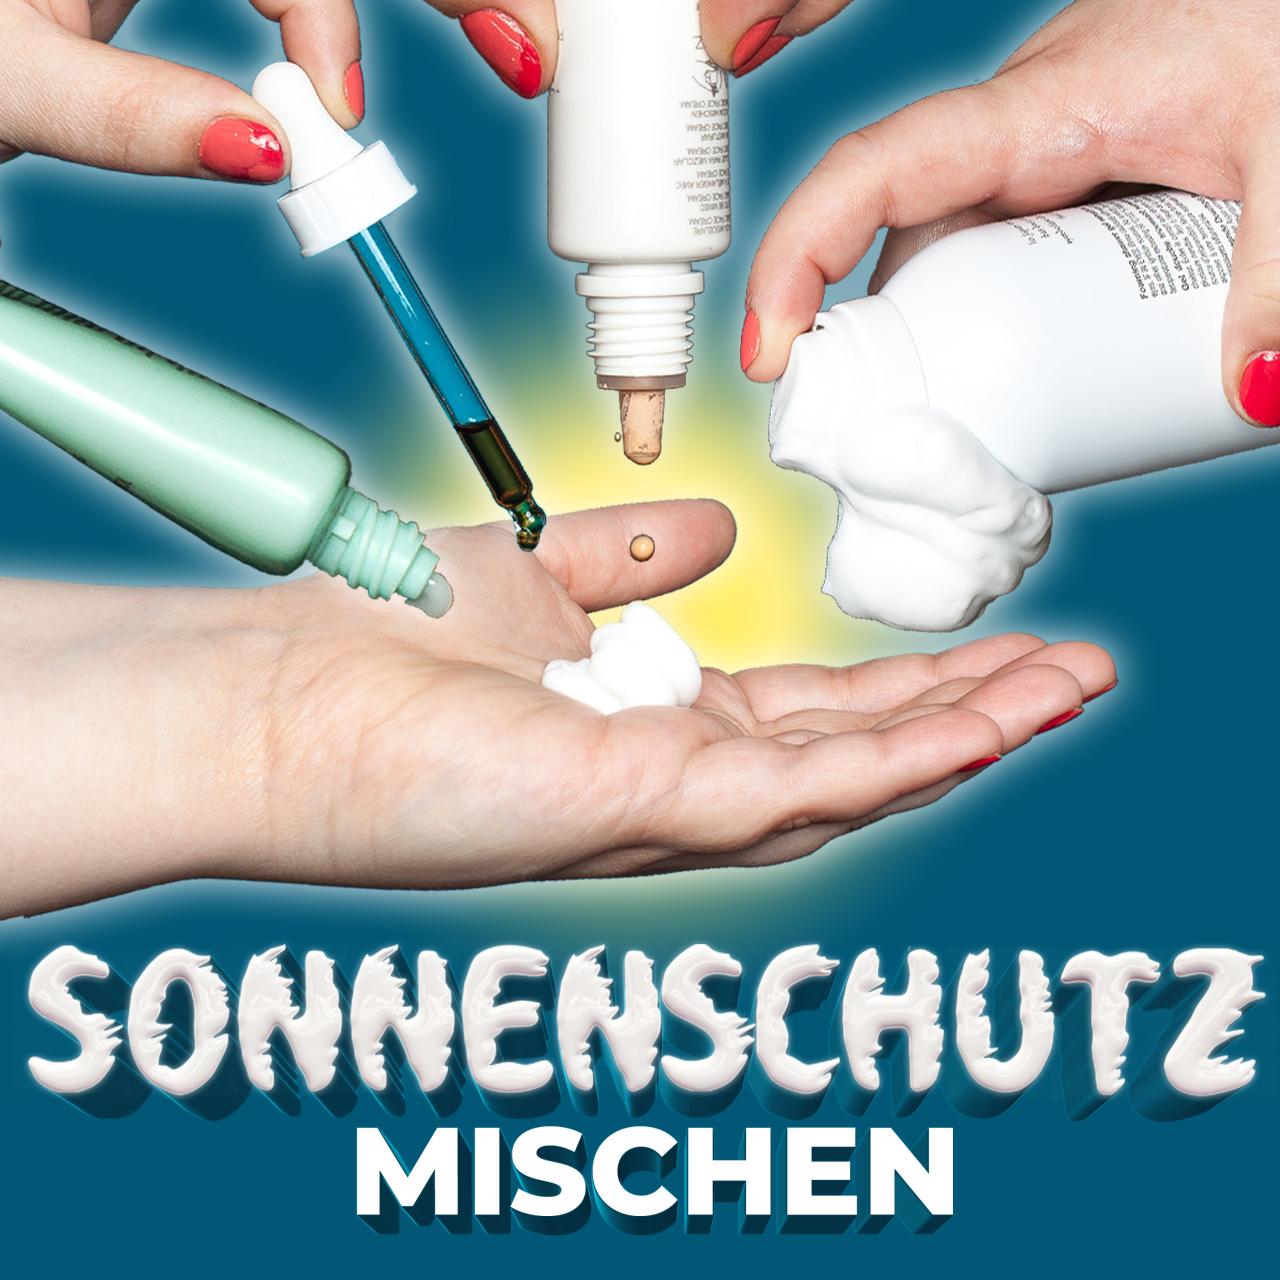 Sonnencreme mischen mit Toner Make-up Selbstbräuner Selftanner Highlighter Drops Sonnenschutz SPF mixen